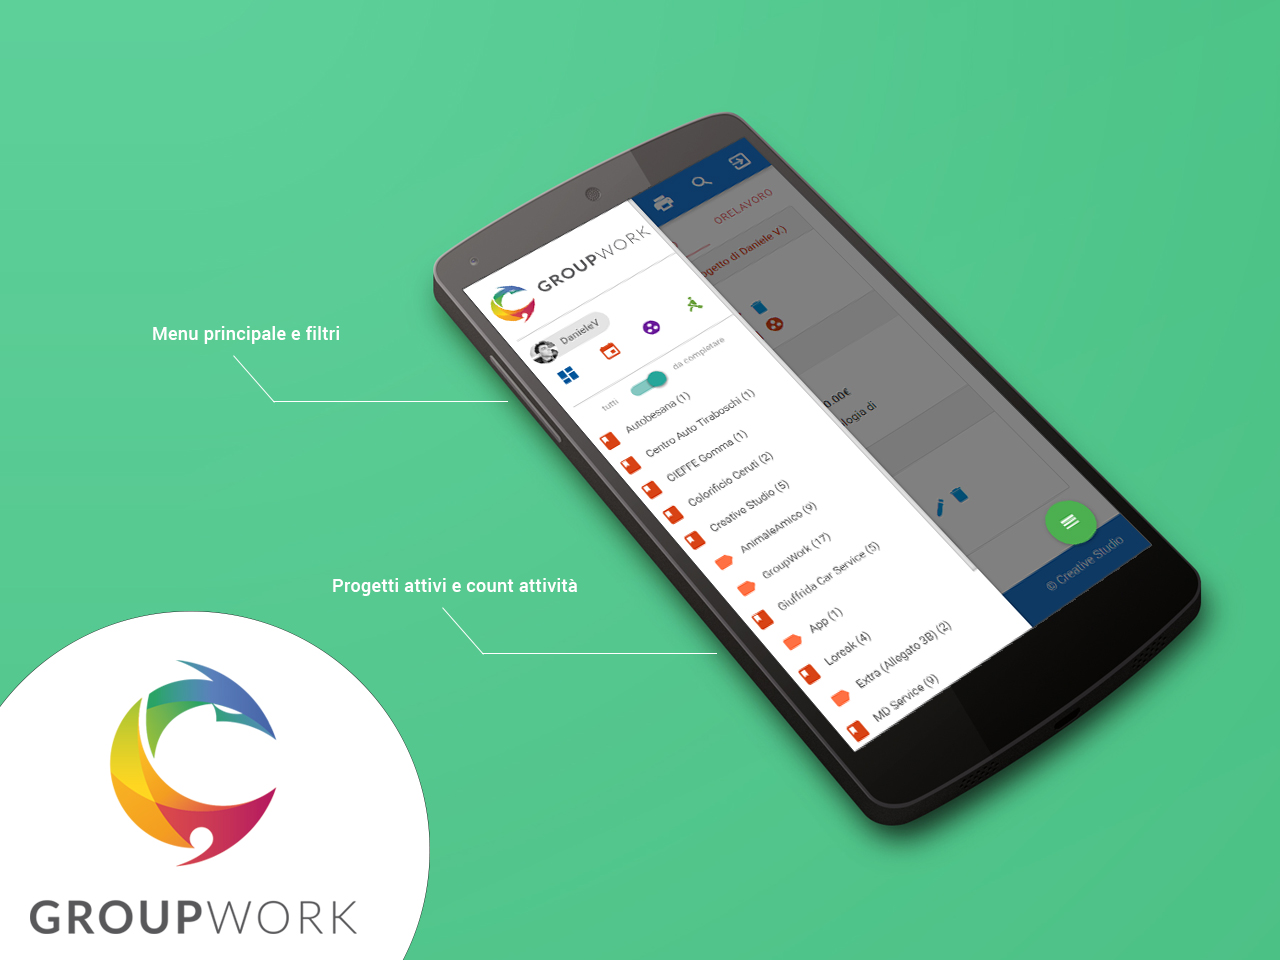 GroupWork software gestione progetti